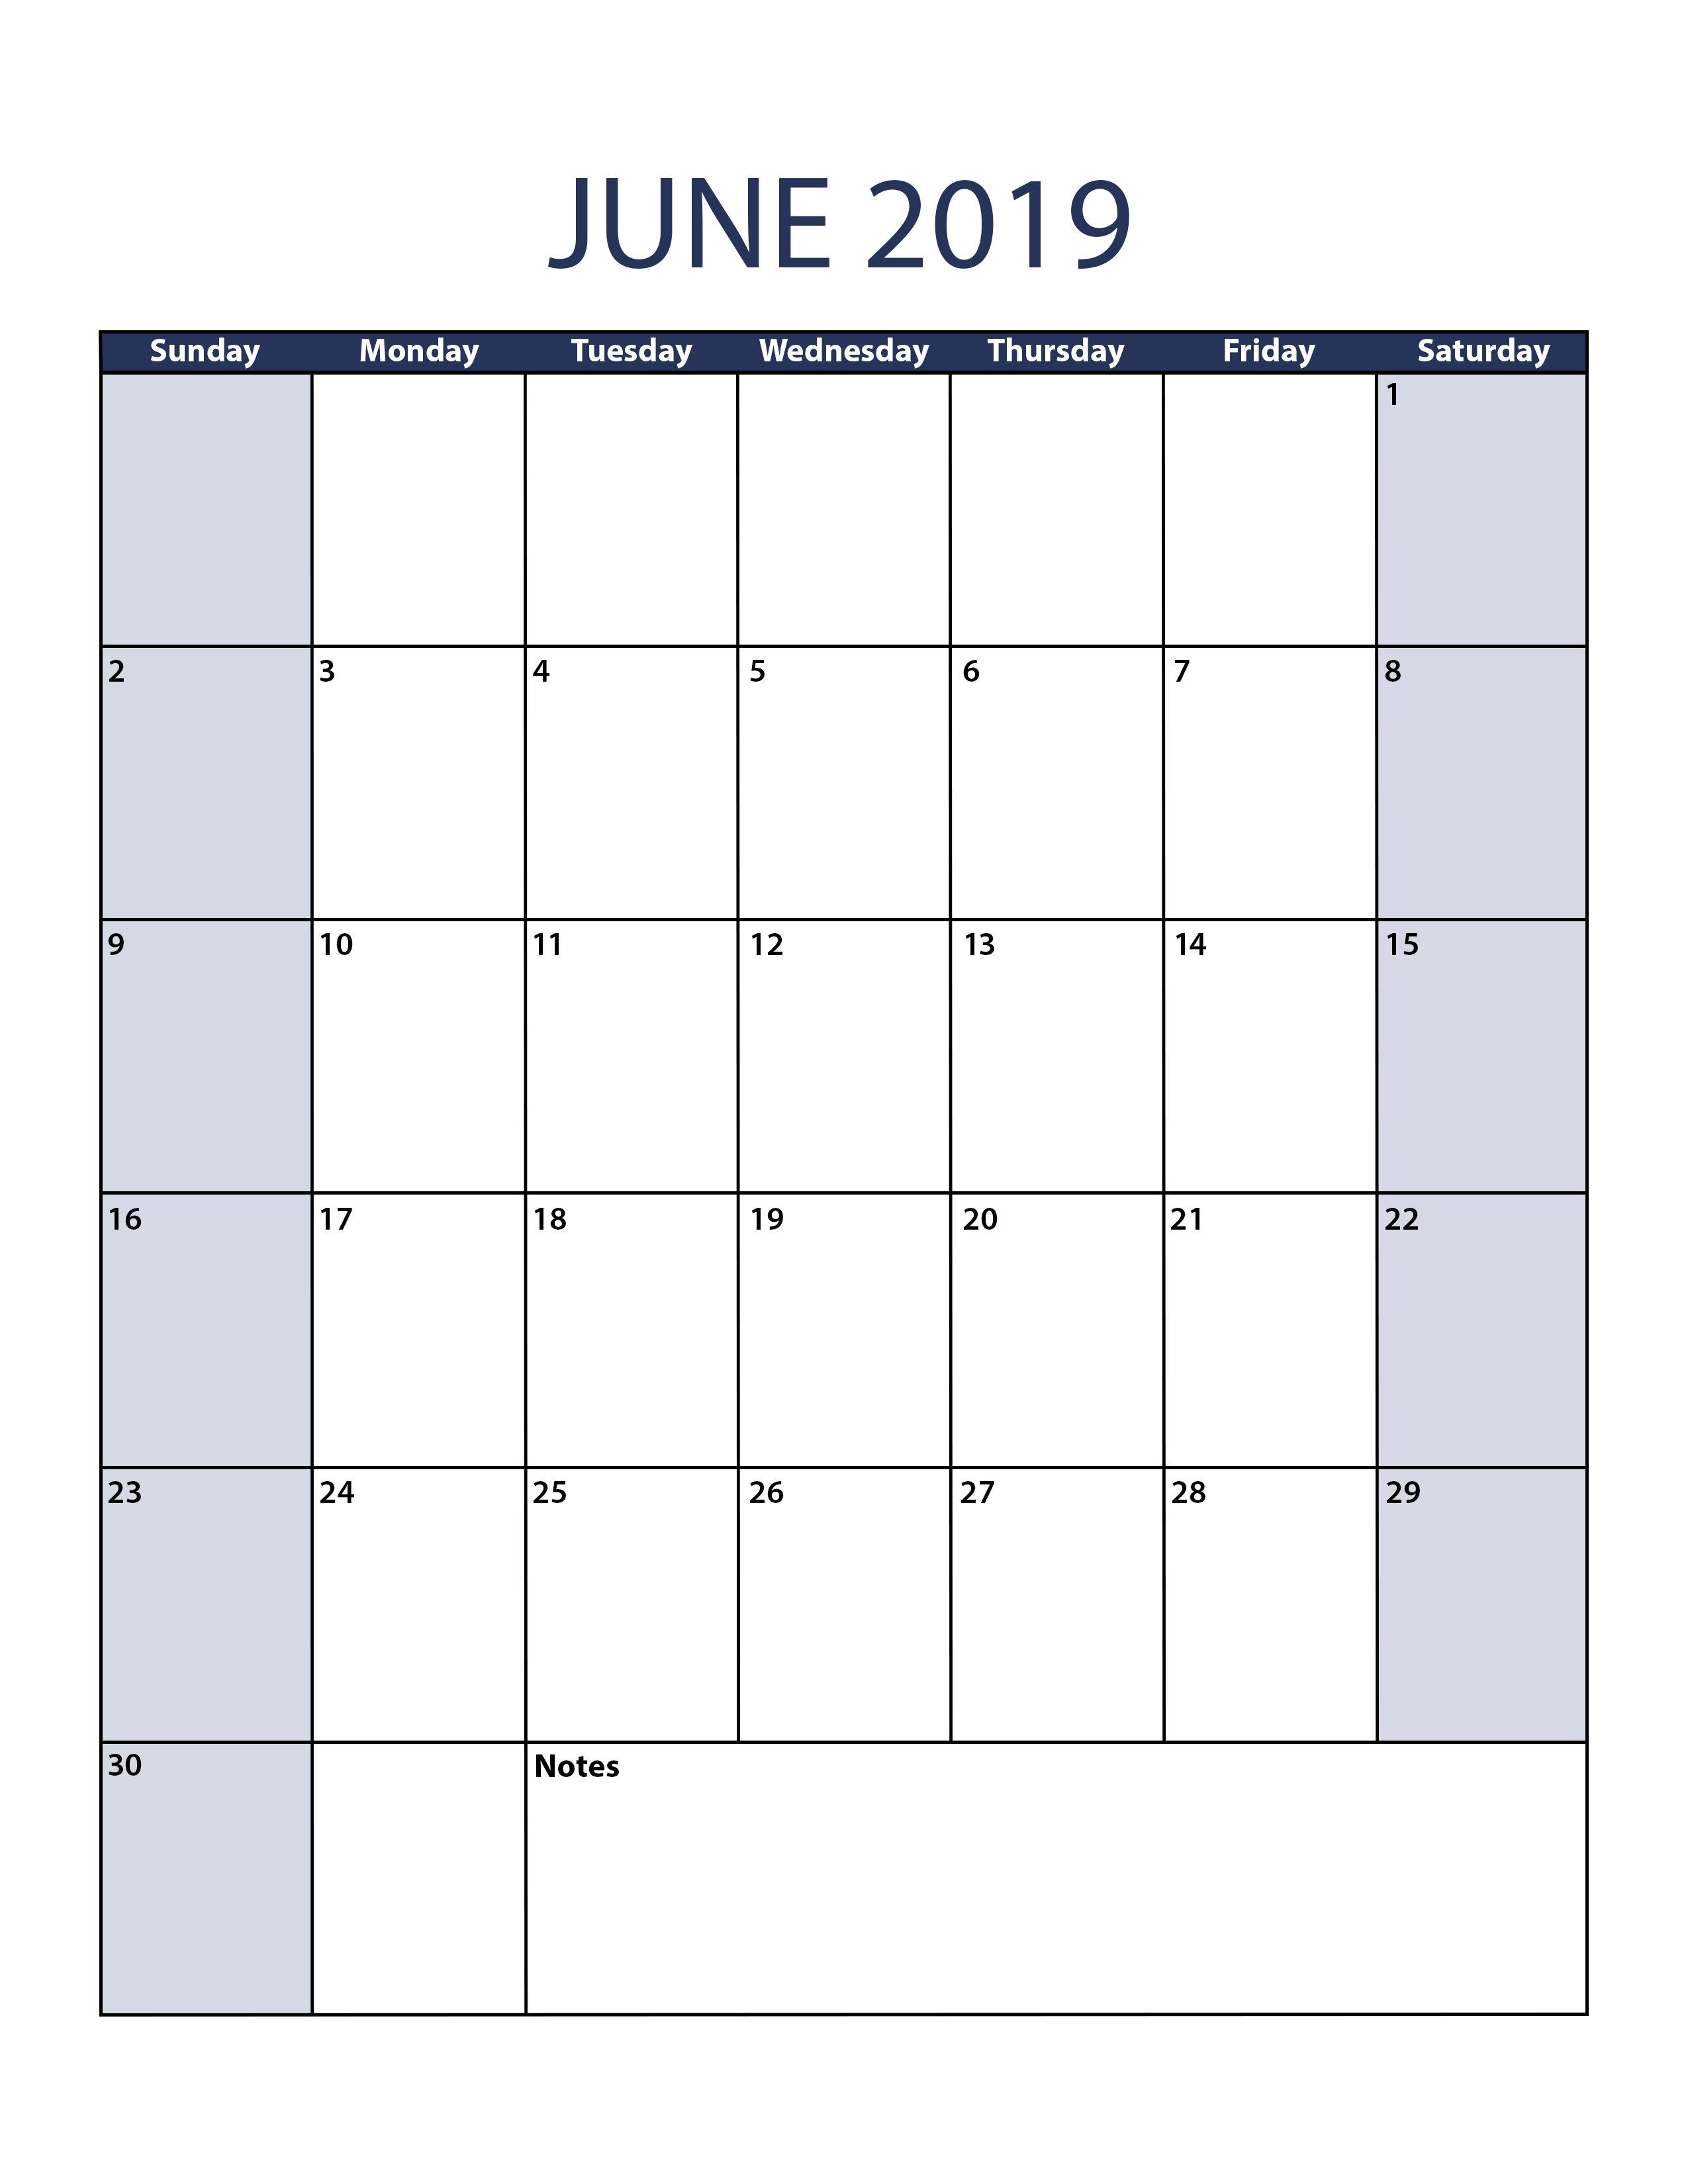 blank june 2019 calendar to print::June 2019 Calendar